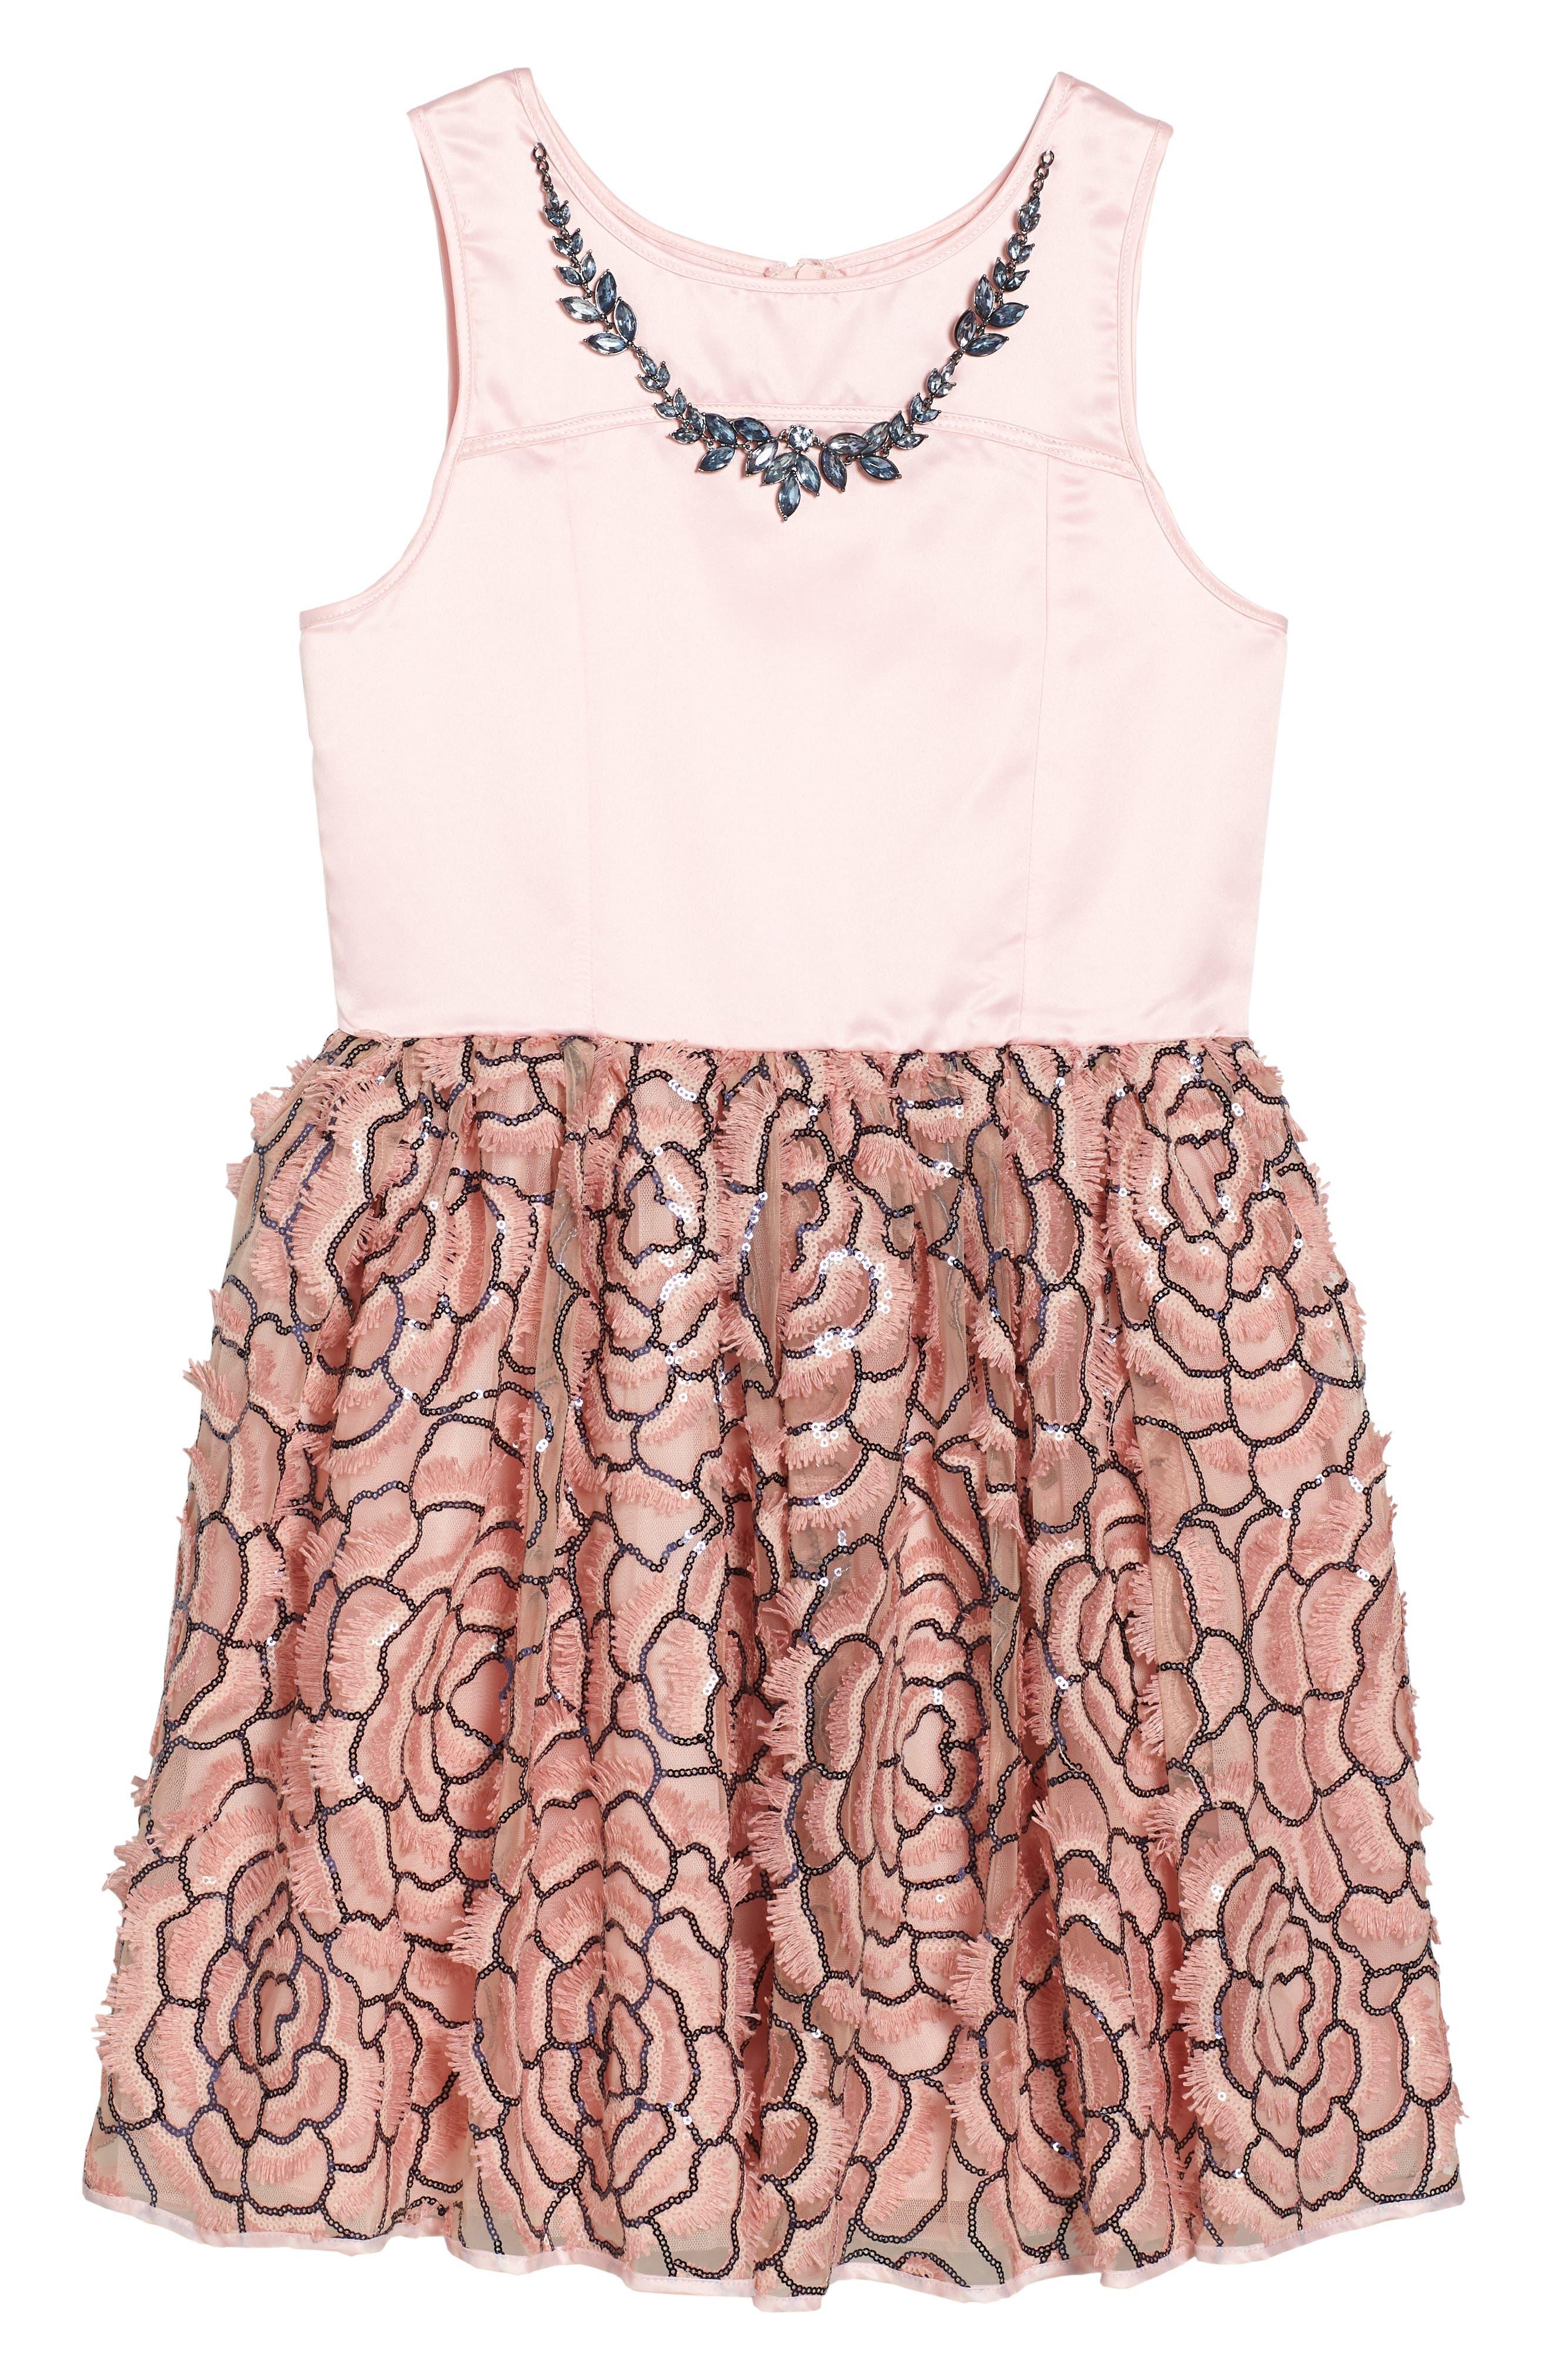 Alternate Image 1 Selected - Nanette Lepore Sequin Mesh & Satin Dress (Big Girls)